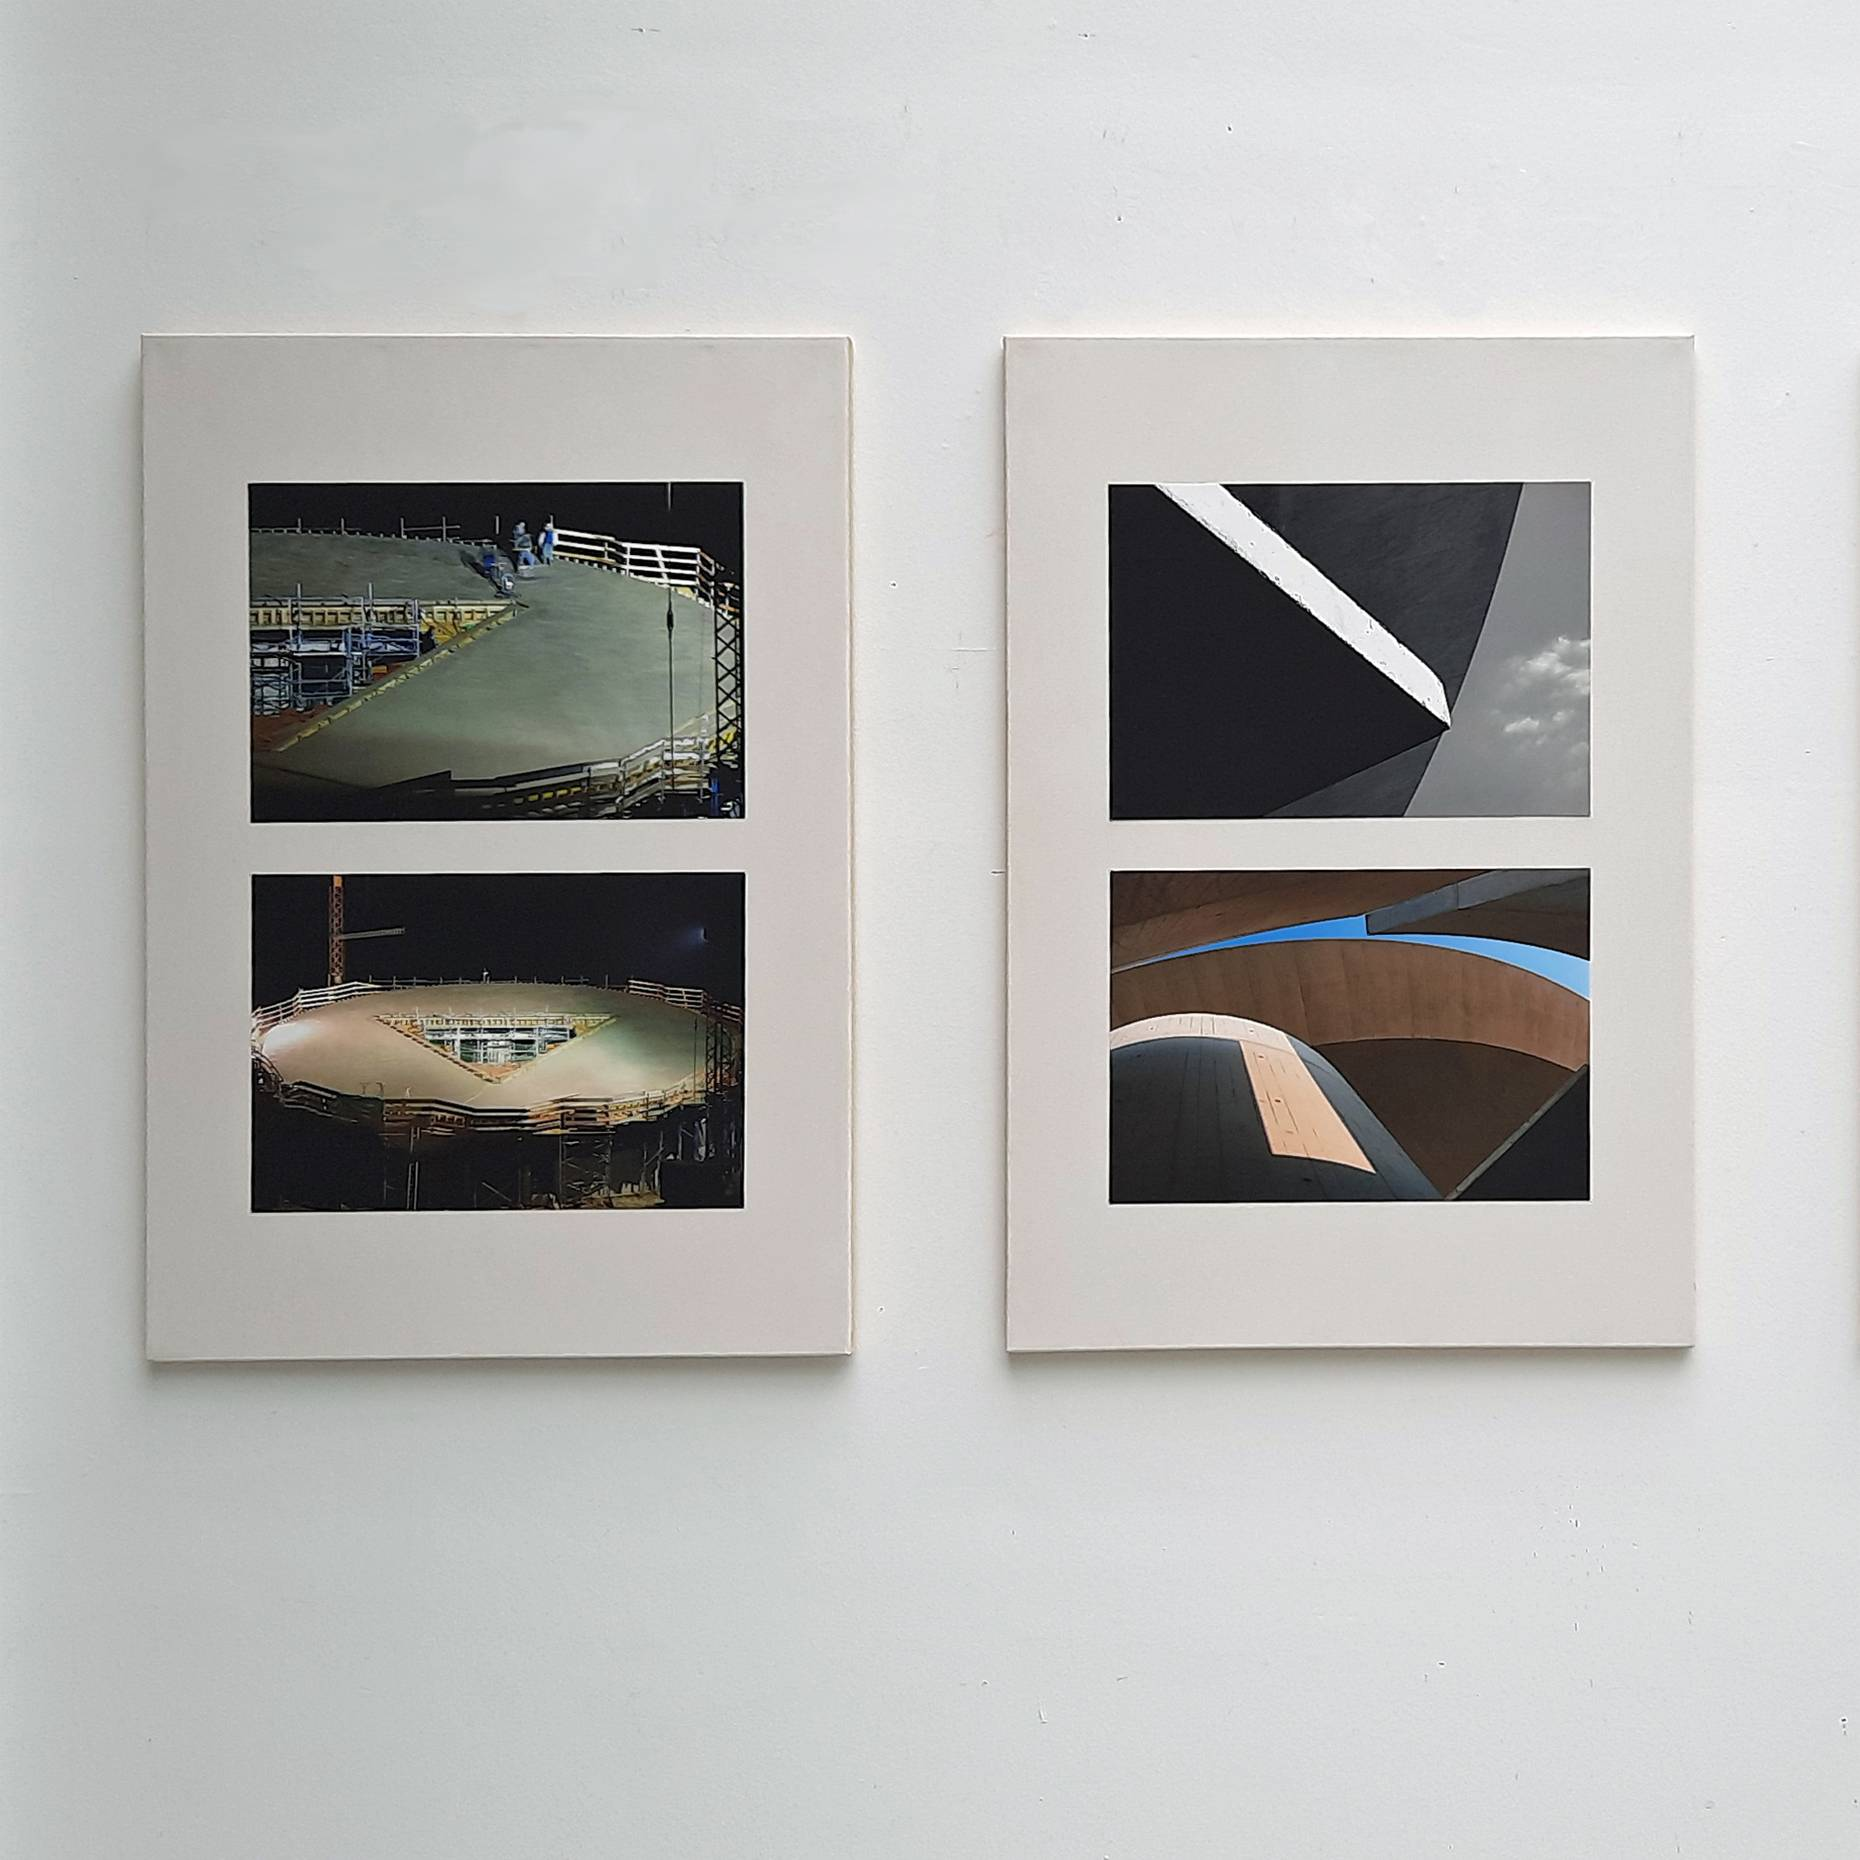 Haus für Musiker 2010-17 Je 2 Fotografien Ultrachrome K3 Tinte a/Canson Infinity 210g/qm aufkaschiert a/Leinwand je 90 x 60 cm